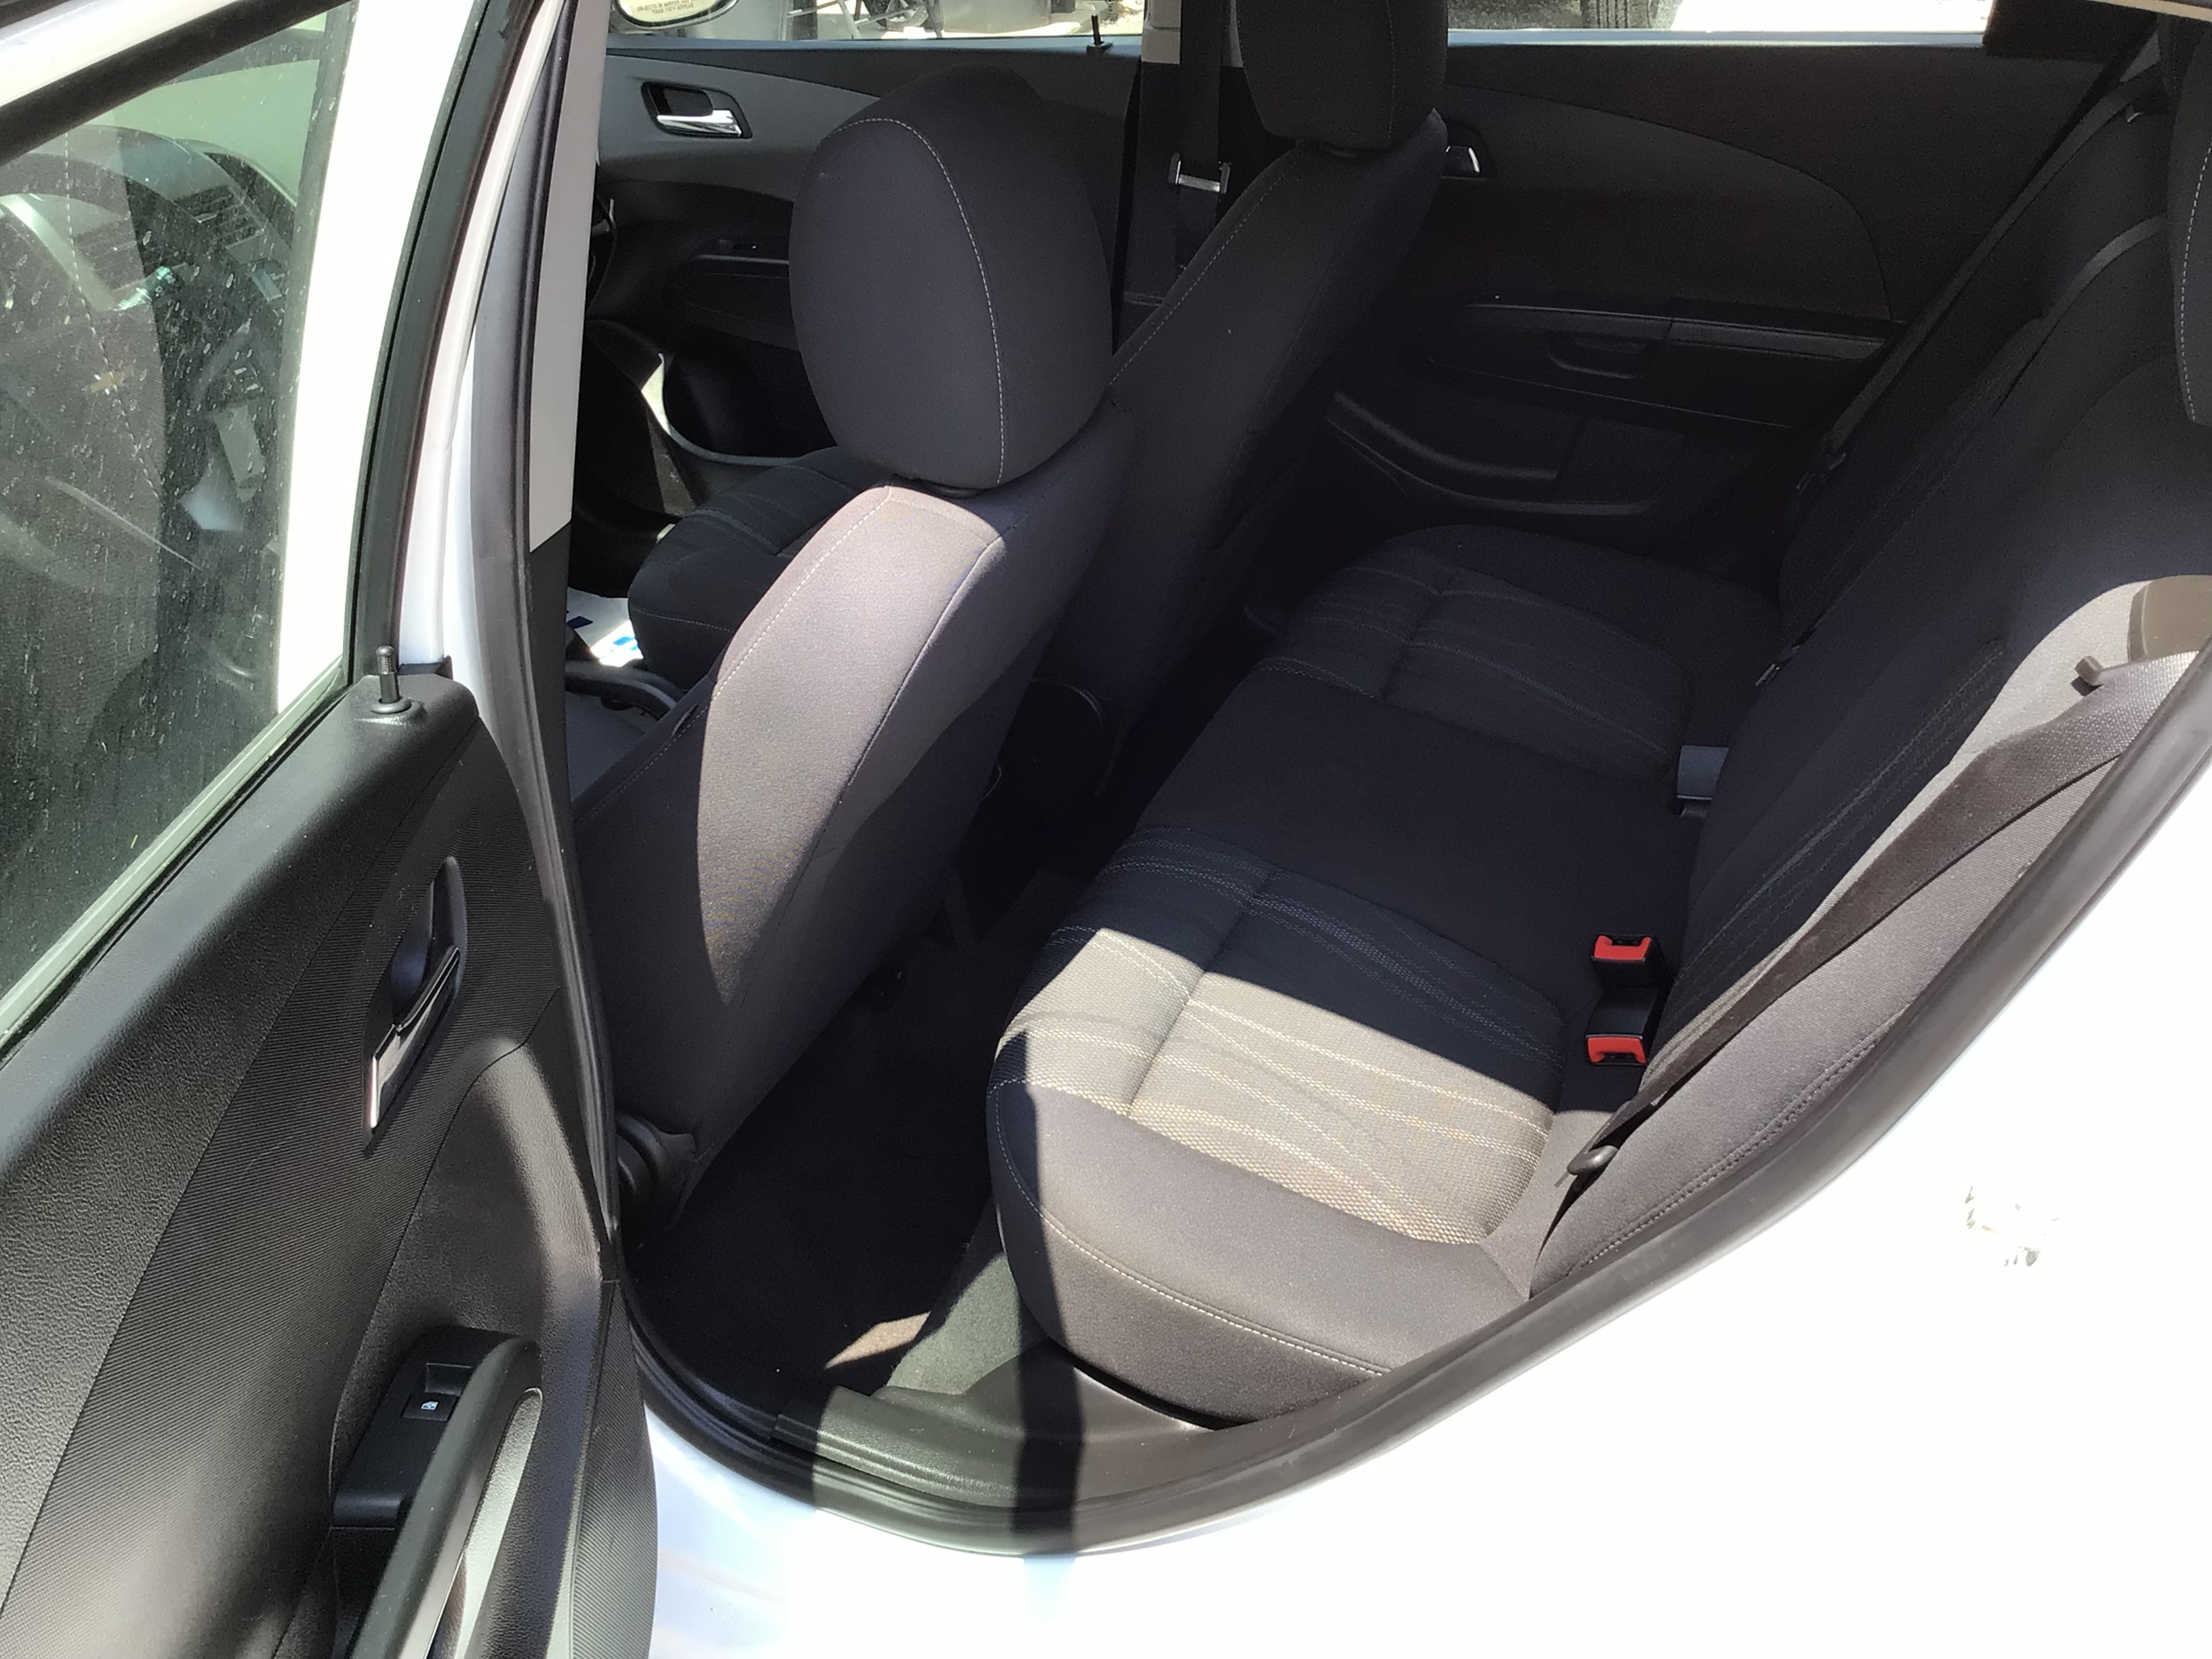 used vehicle - Sedan CHEVROLET SONIC 2015